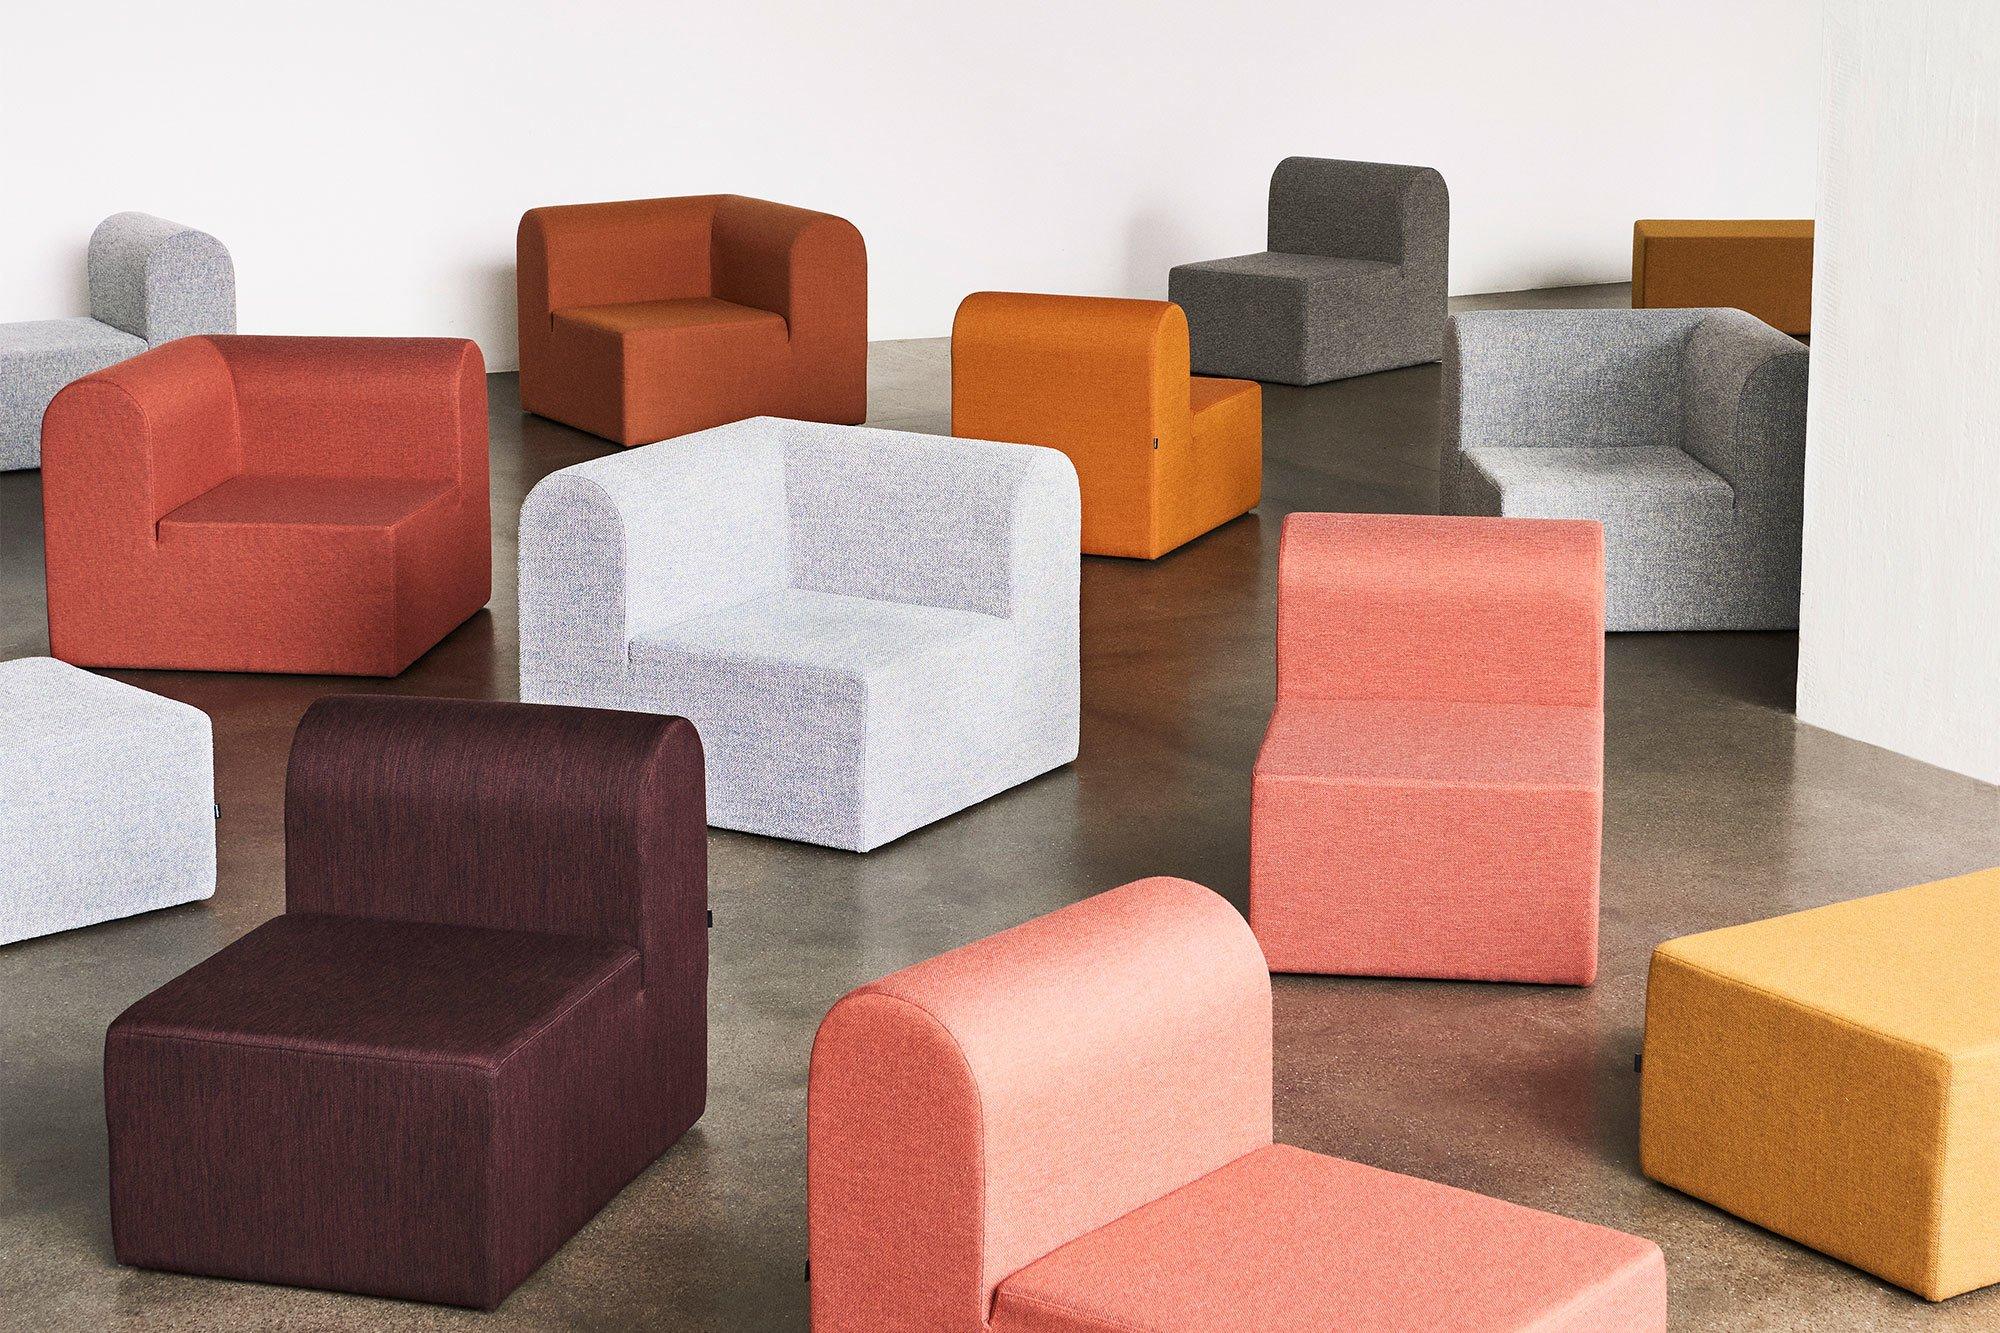 Sofasystem The Paustian Modular Sofa von Erik Rasmussen